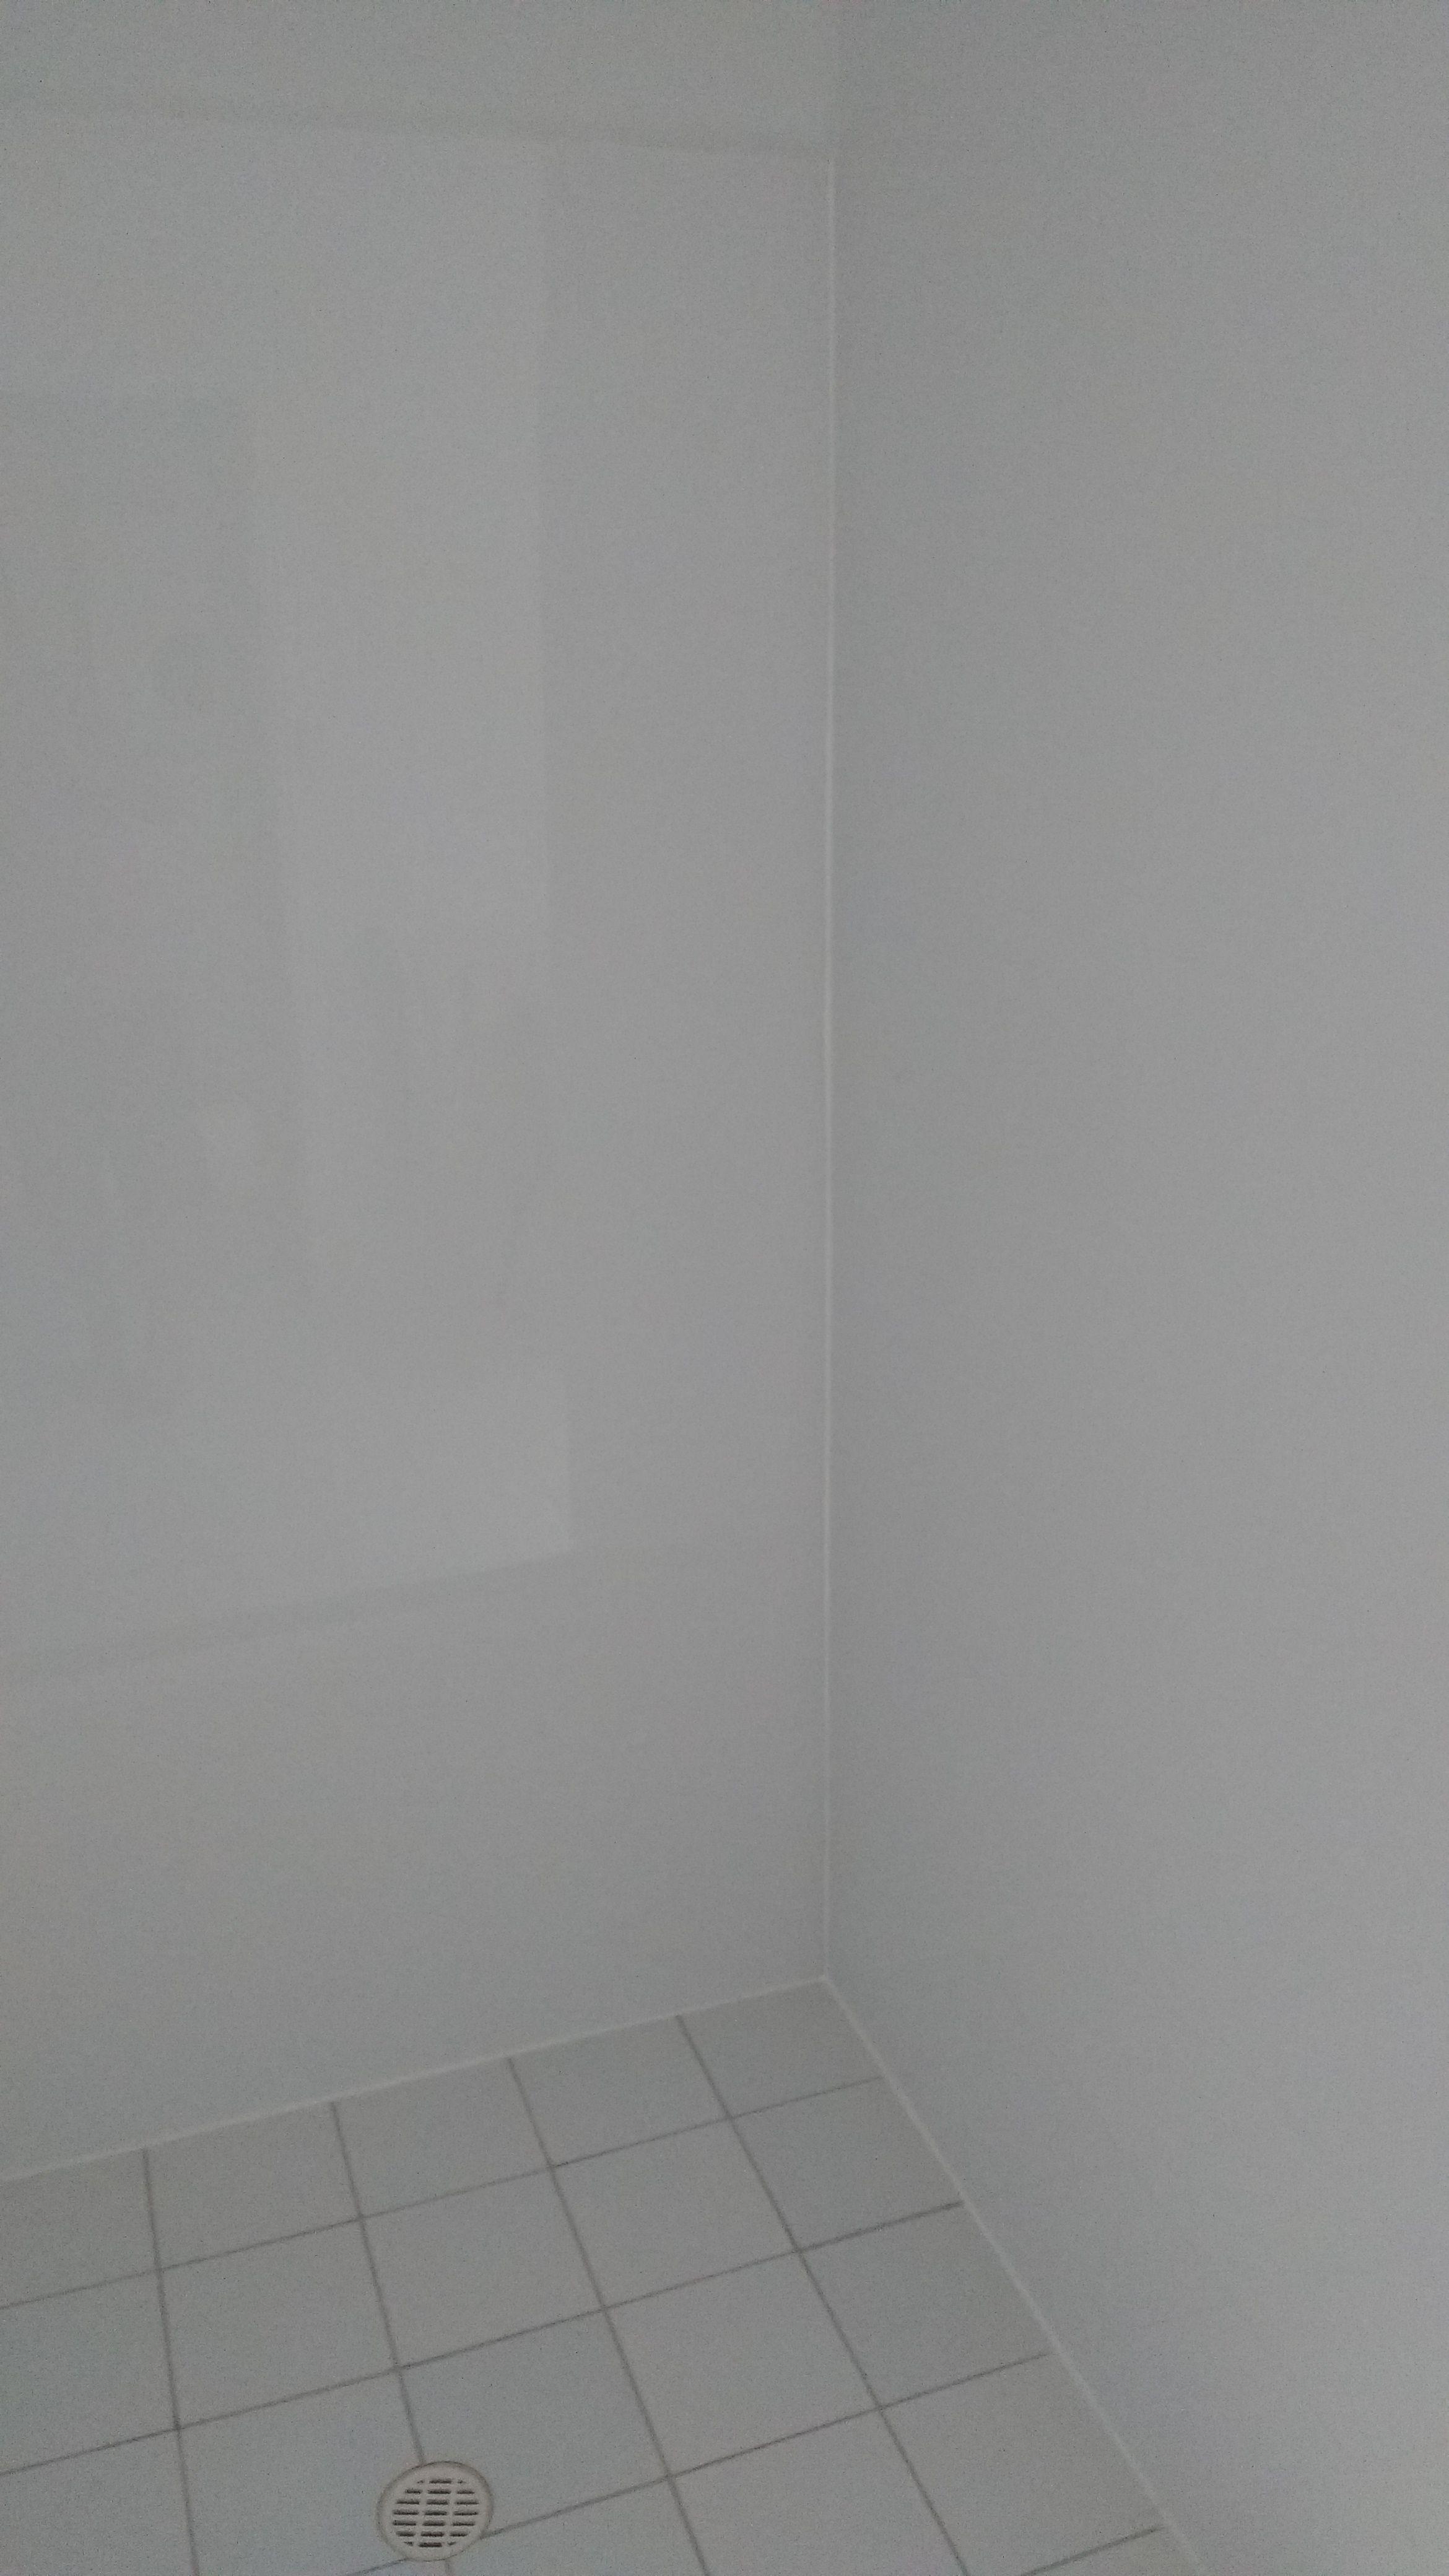 Our Acrylic Splashbacks Can Go Straight Over Existing Tiled Walls Just Like These Splashback Panels Have No Si Acrylic Splashbacks Shower Wall Splashback